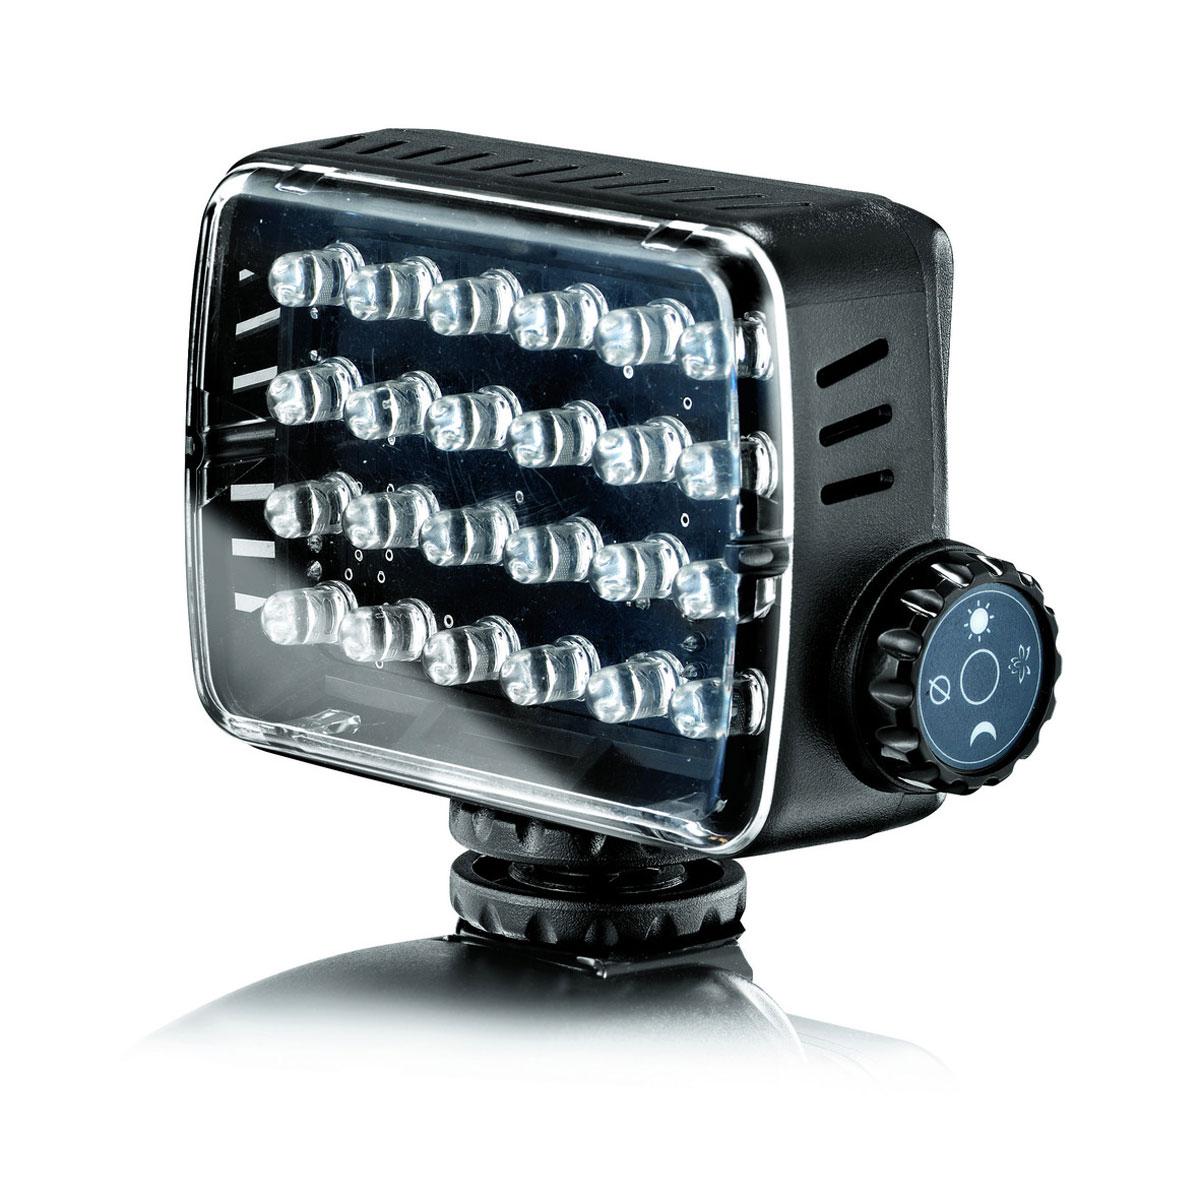 Flash appareil photo Manfrotto ML240 Torche LED compacte (24 LED)